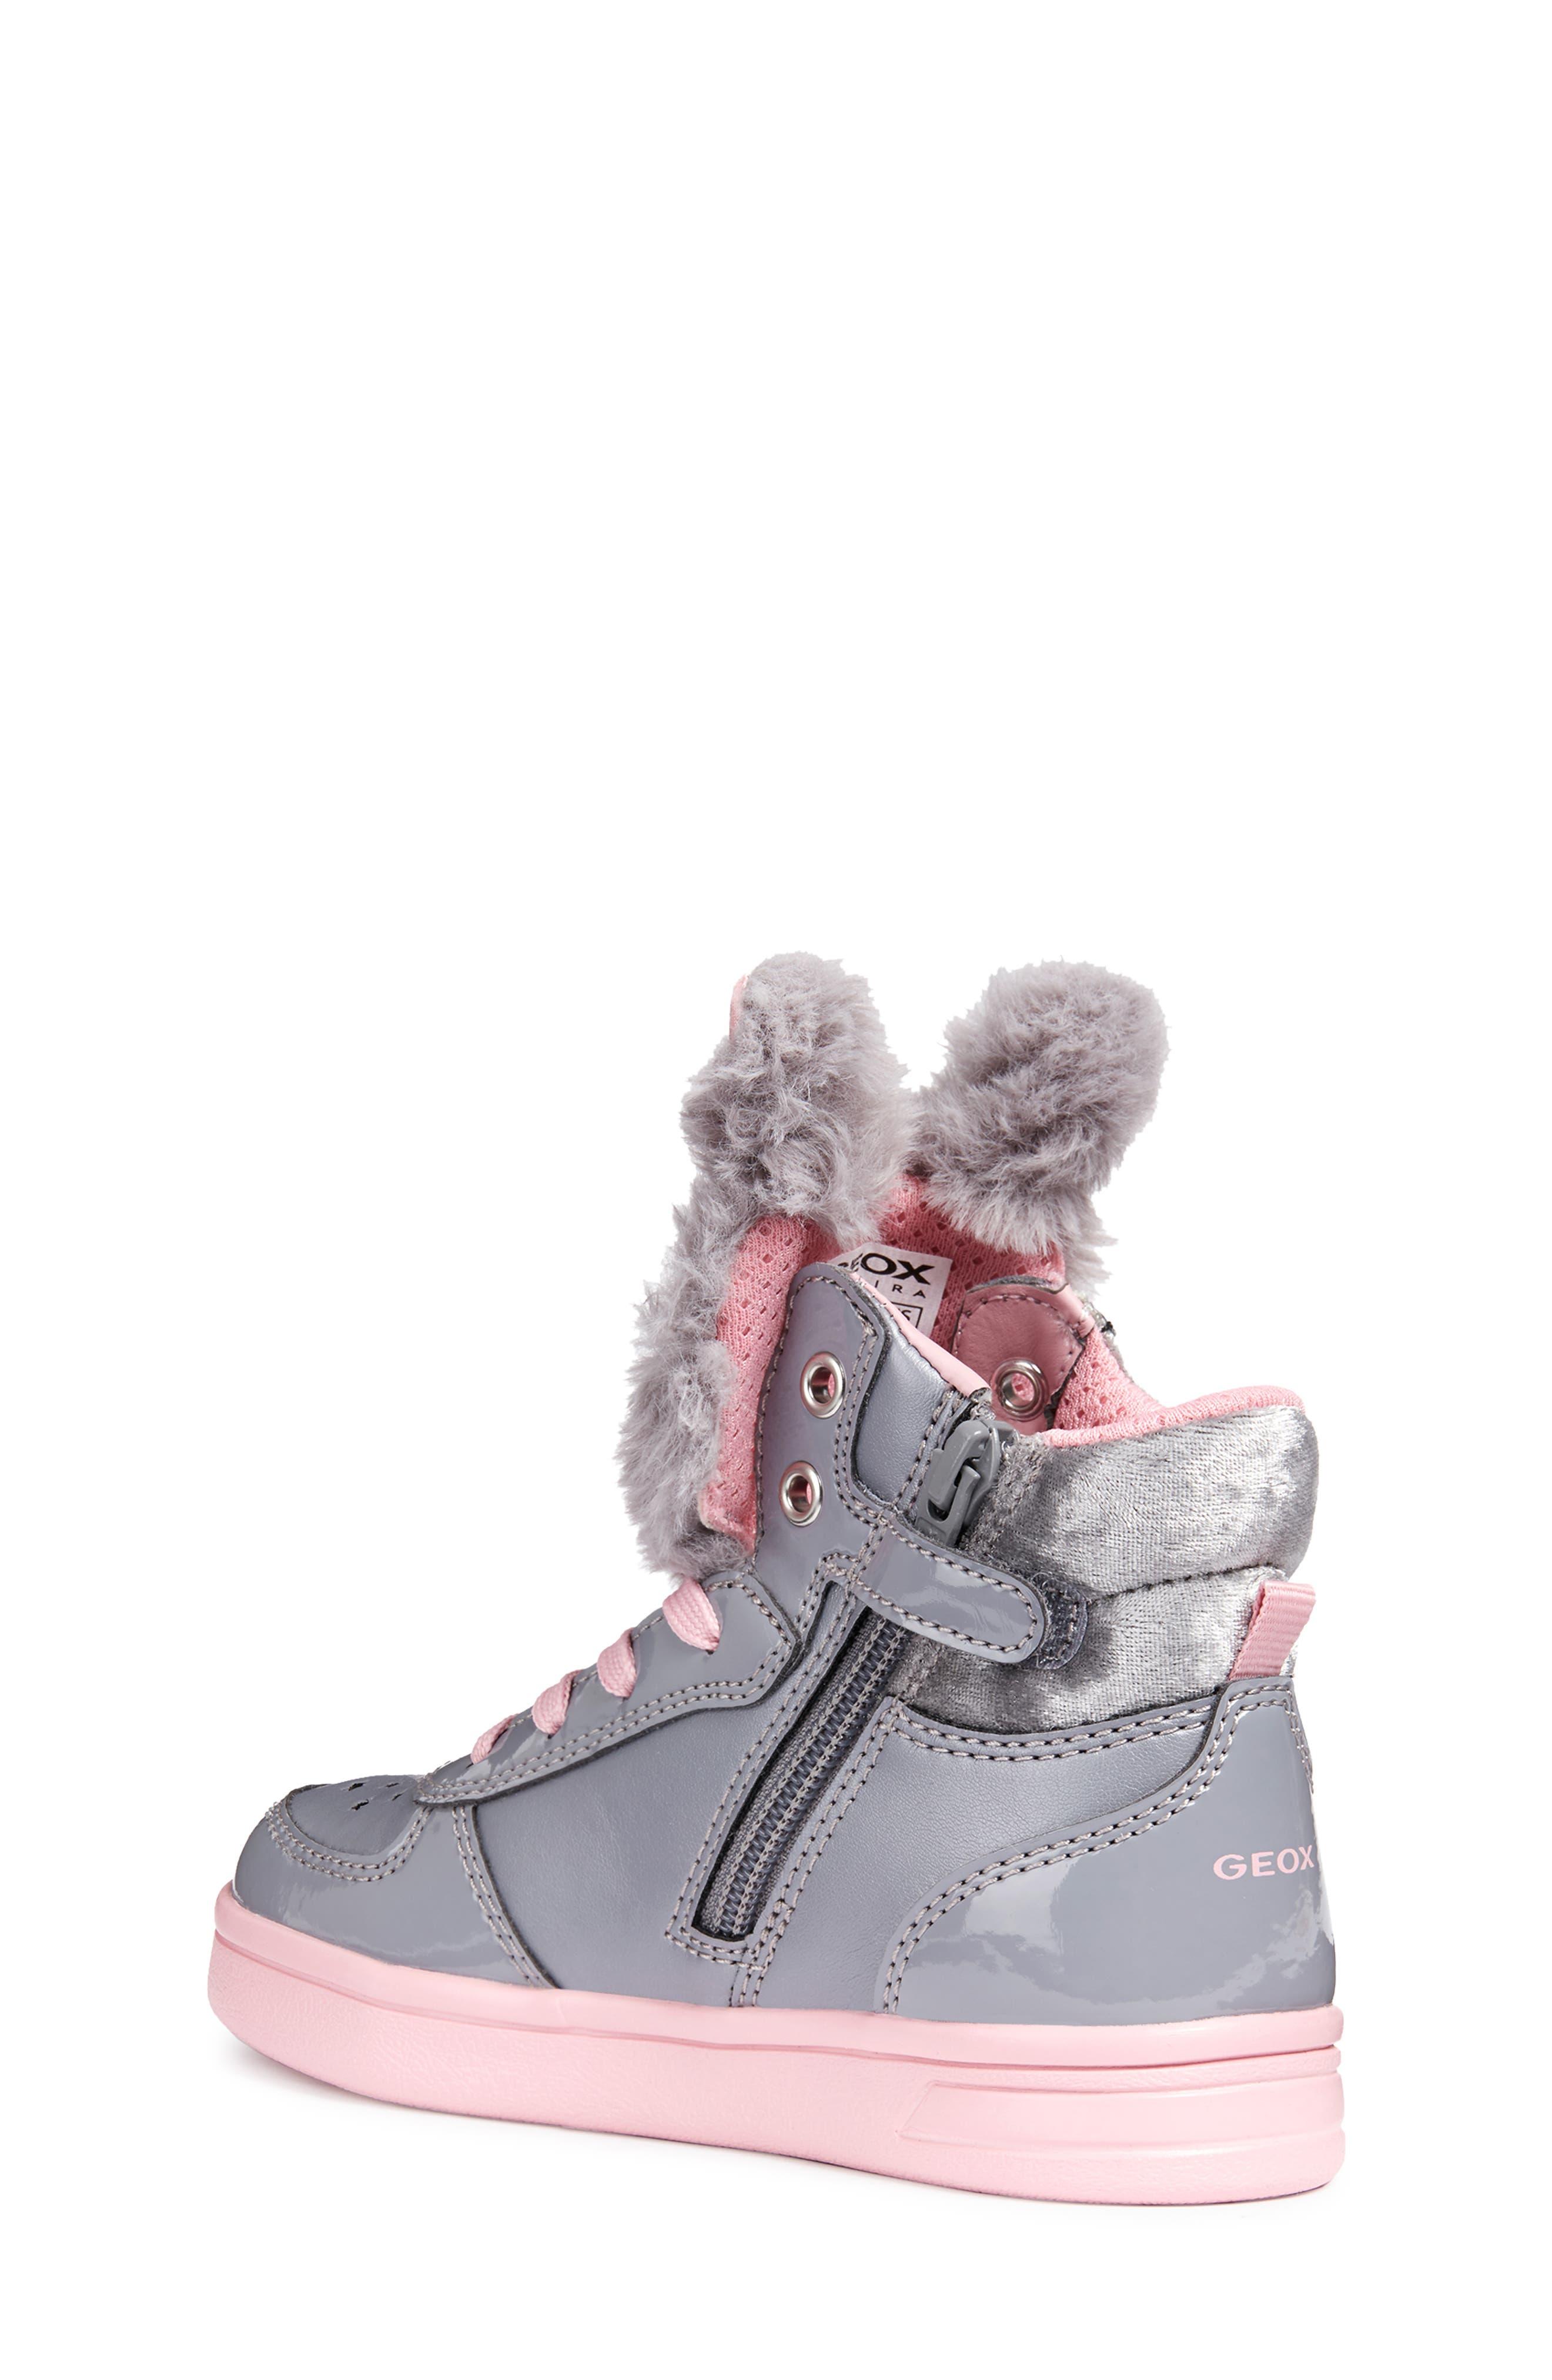 DJ Rock Fuzzy Friend Sneaker,                             Alternate thumbnail 2, color,                             GREY/PINK